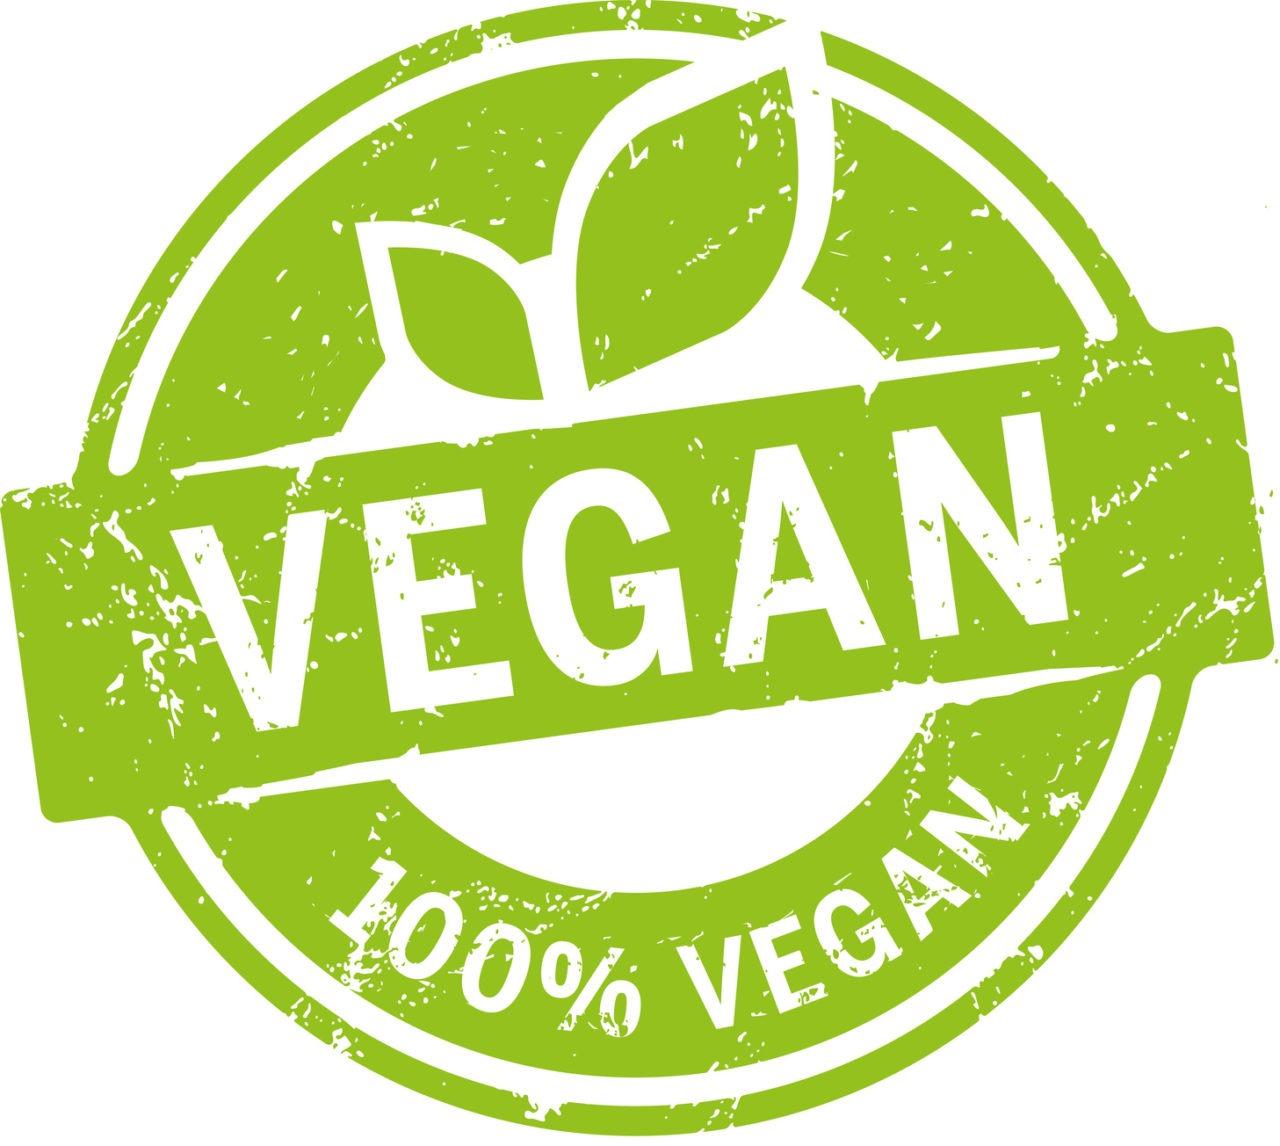 ok_vegano-1280x1146.jpg